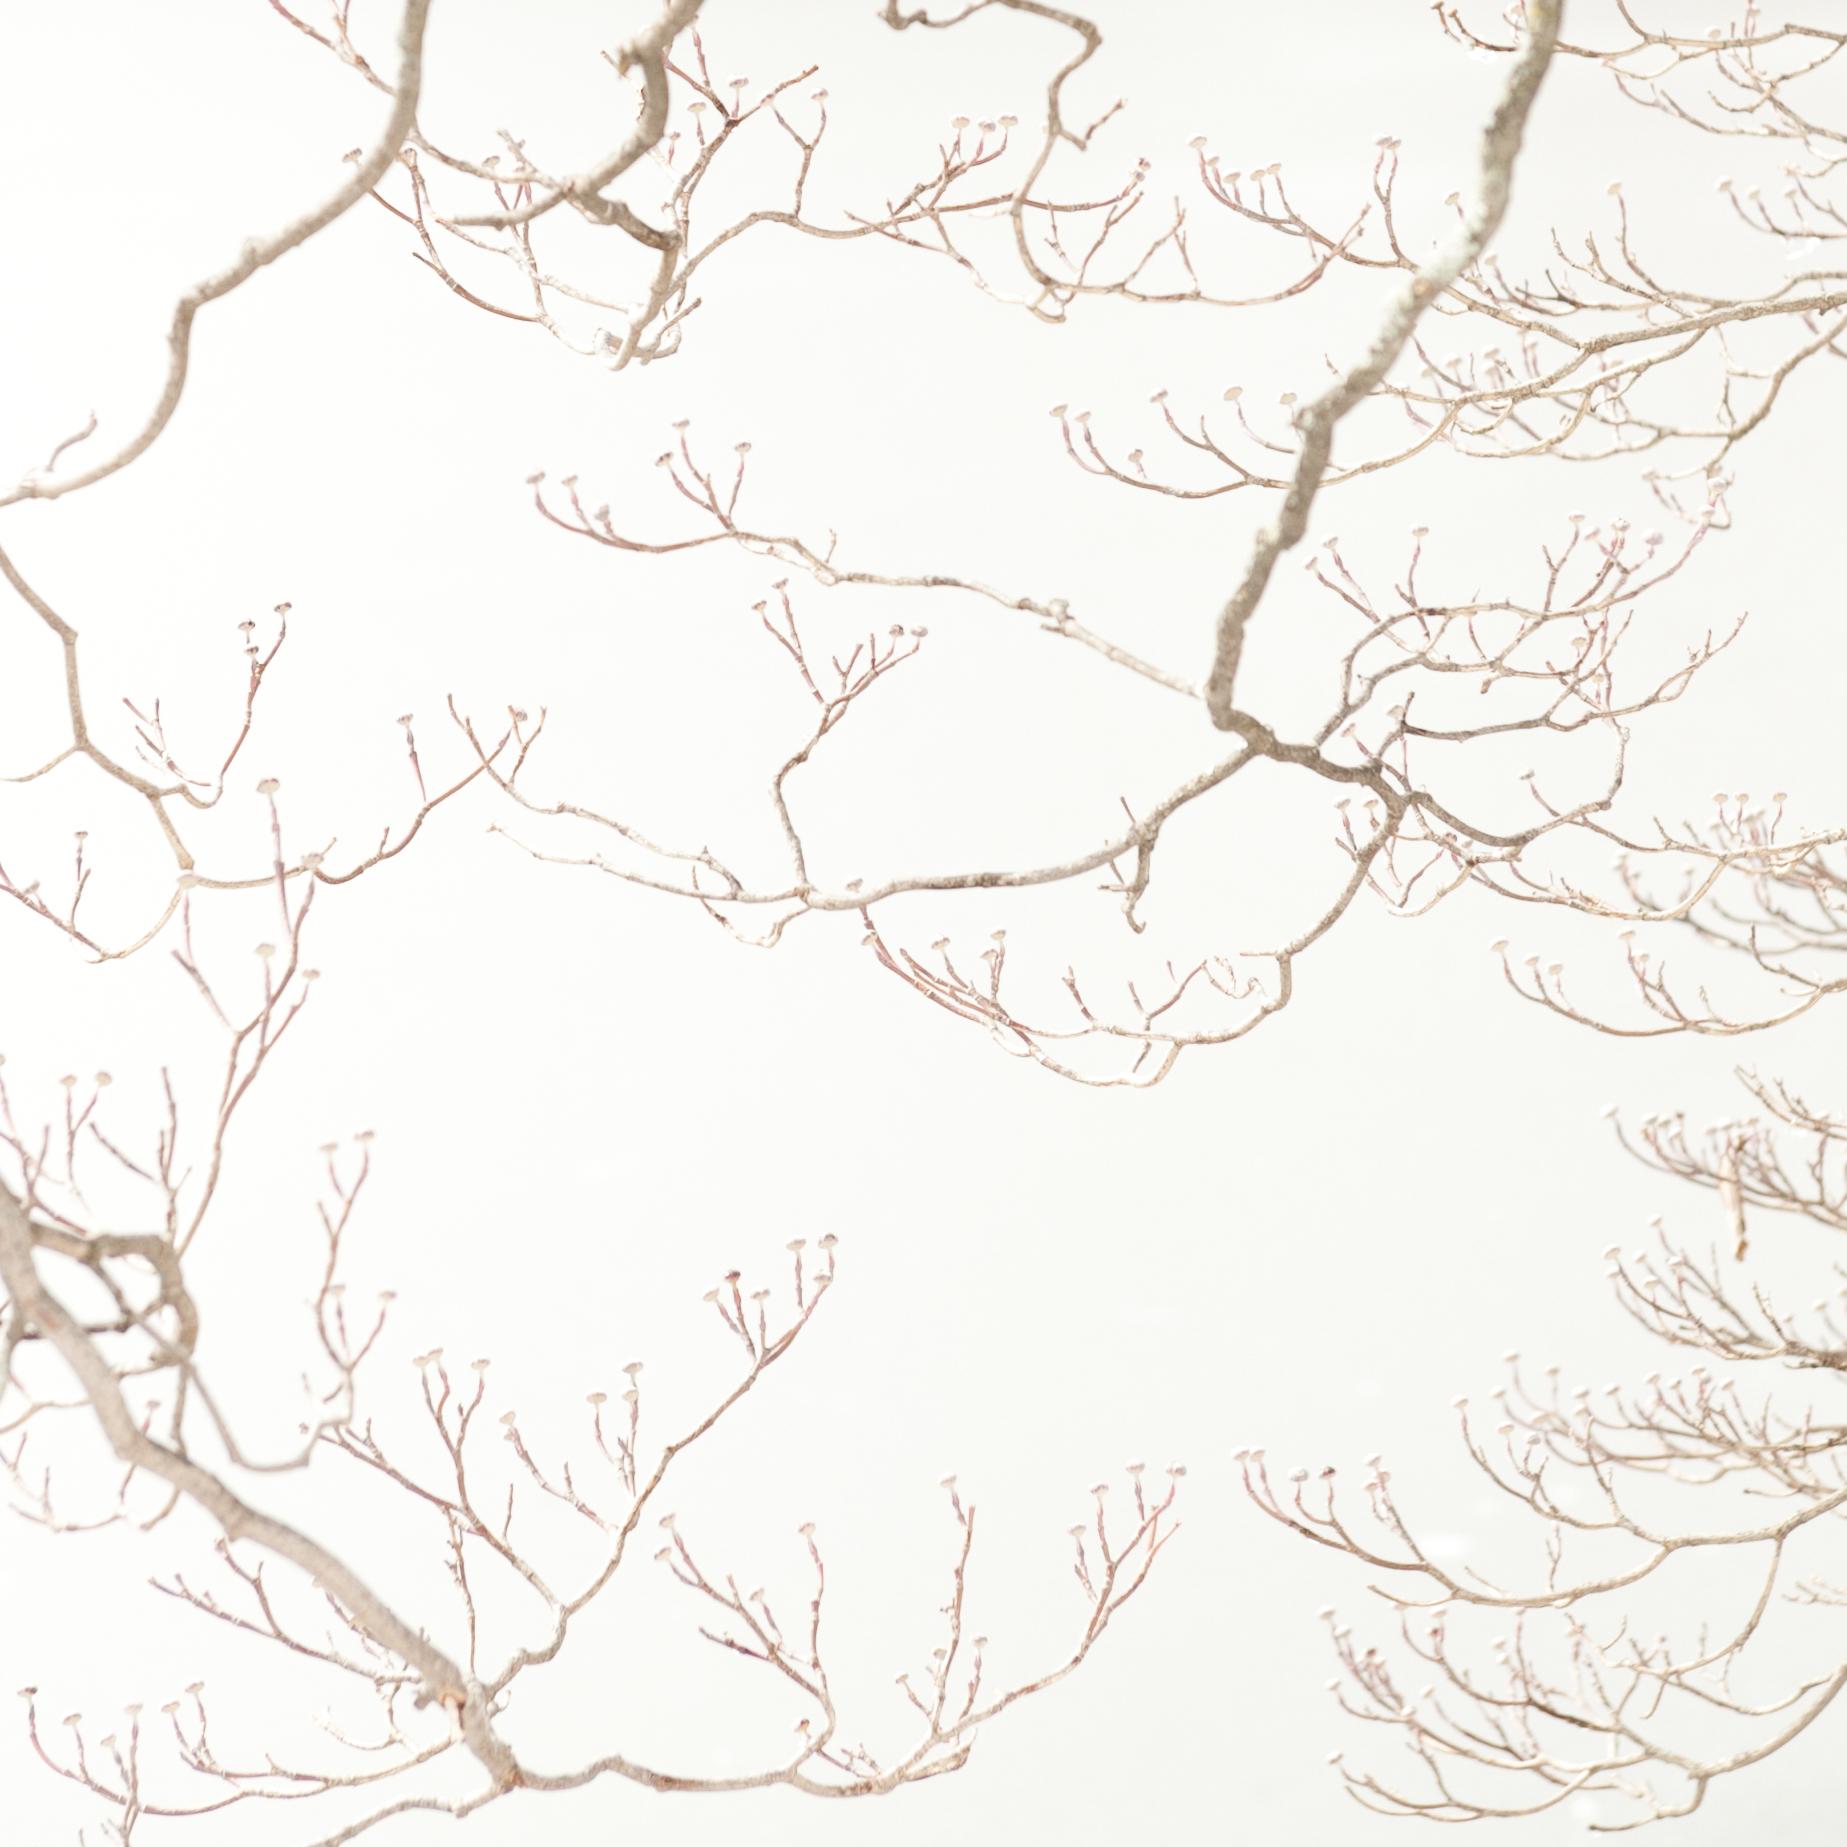 Study in Snow, Dogwood Tree, 3